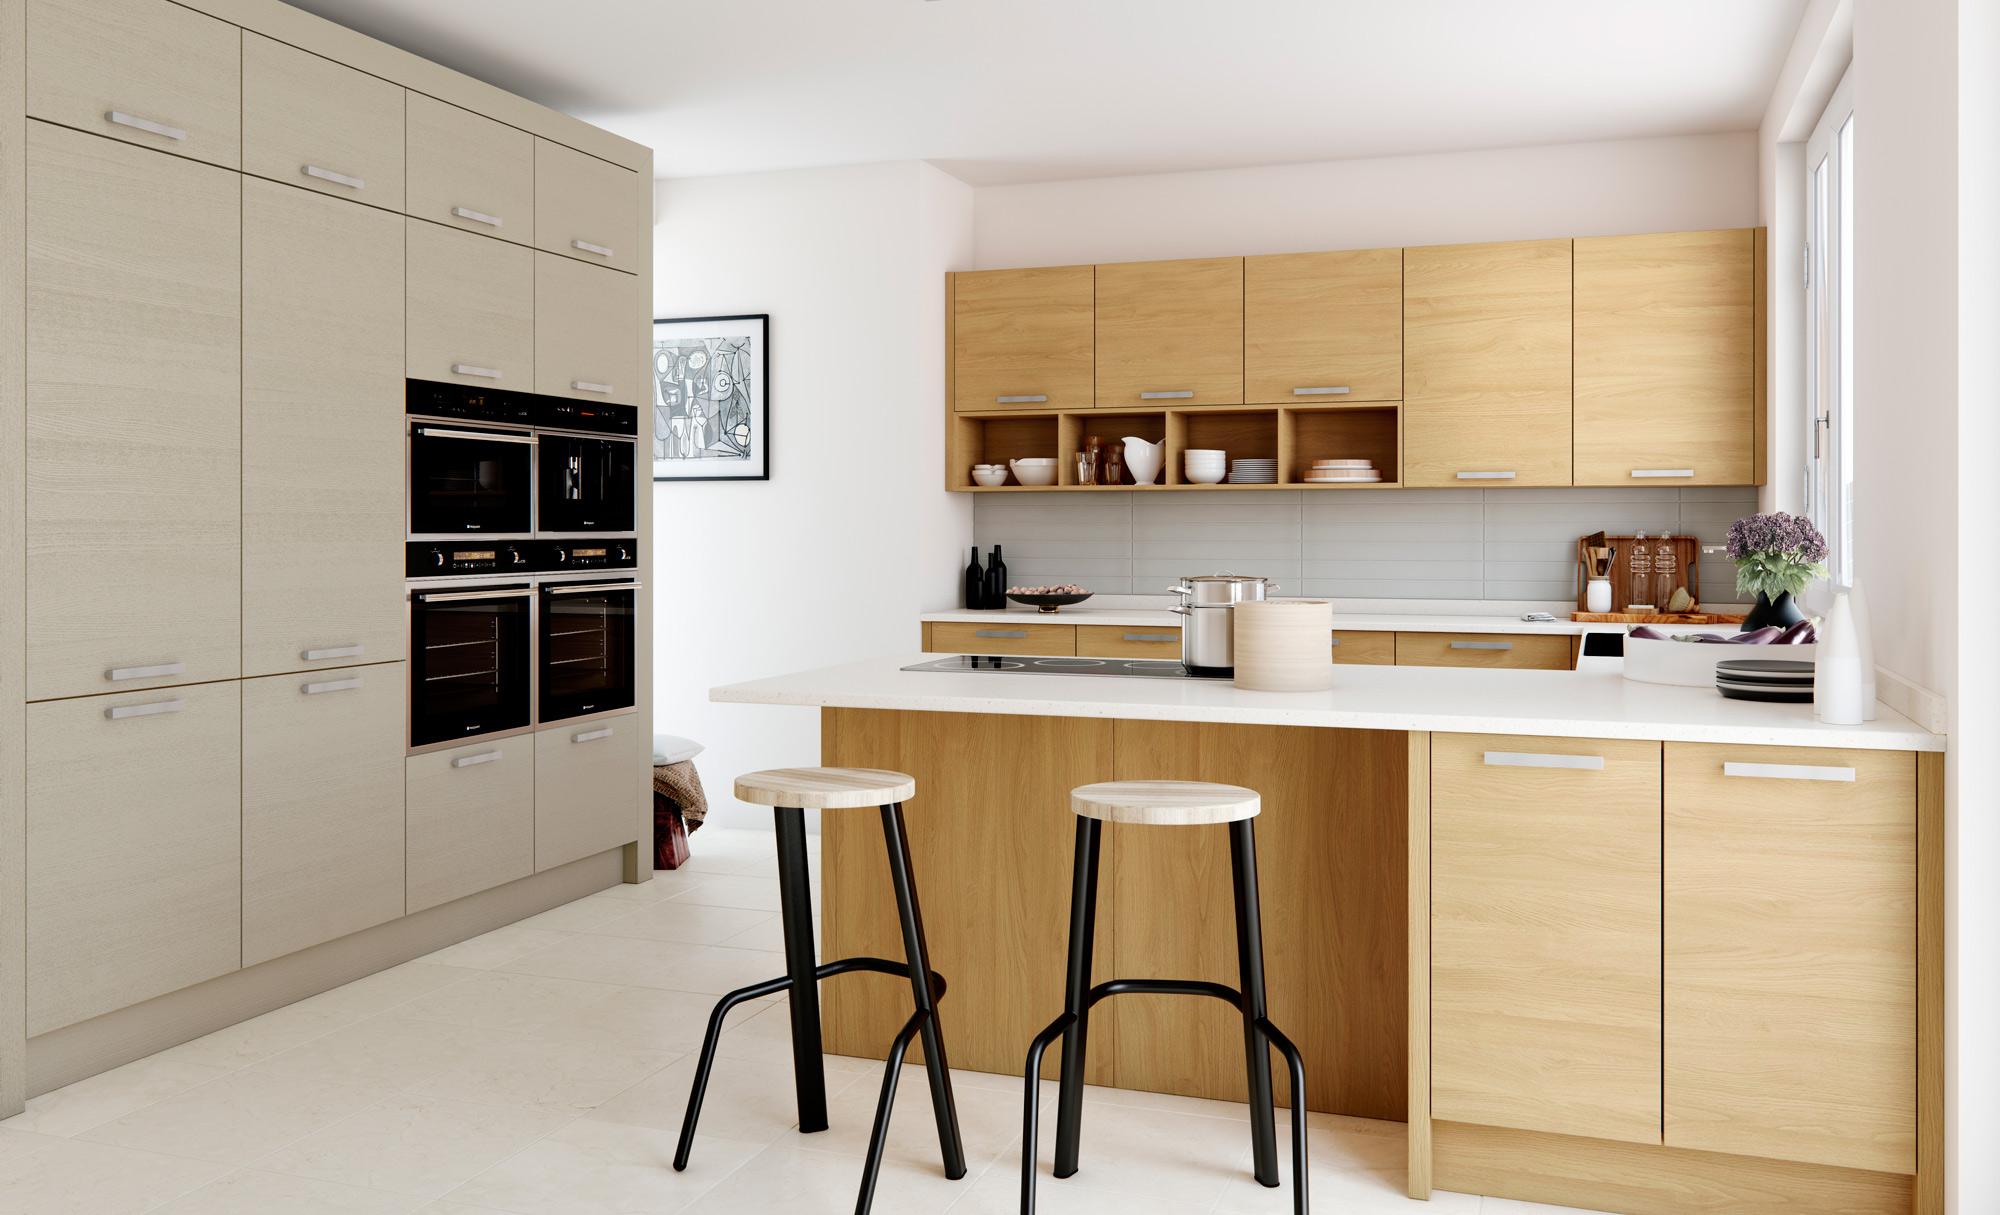 Modern Contemporary Tavola Stained Light Oak Painted Light Grey Kitchen - Kitchen Design - Alan Kelly Kitchens - Waterford